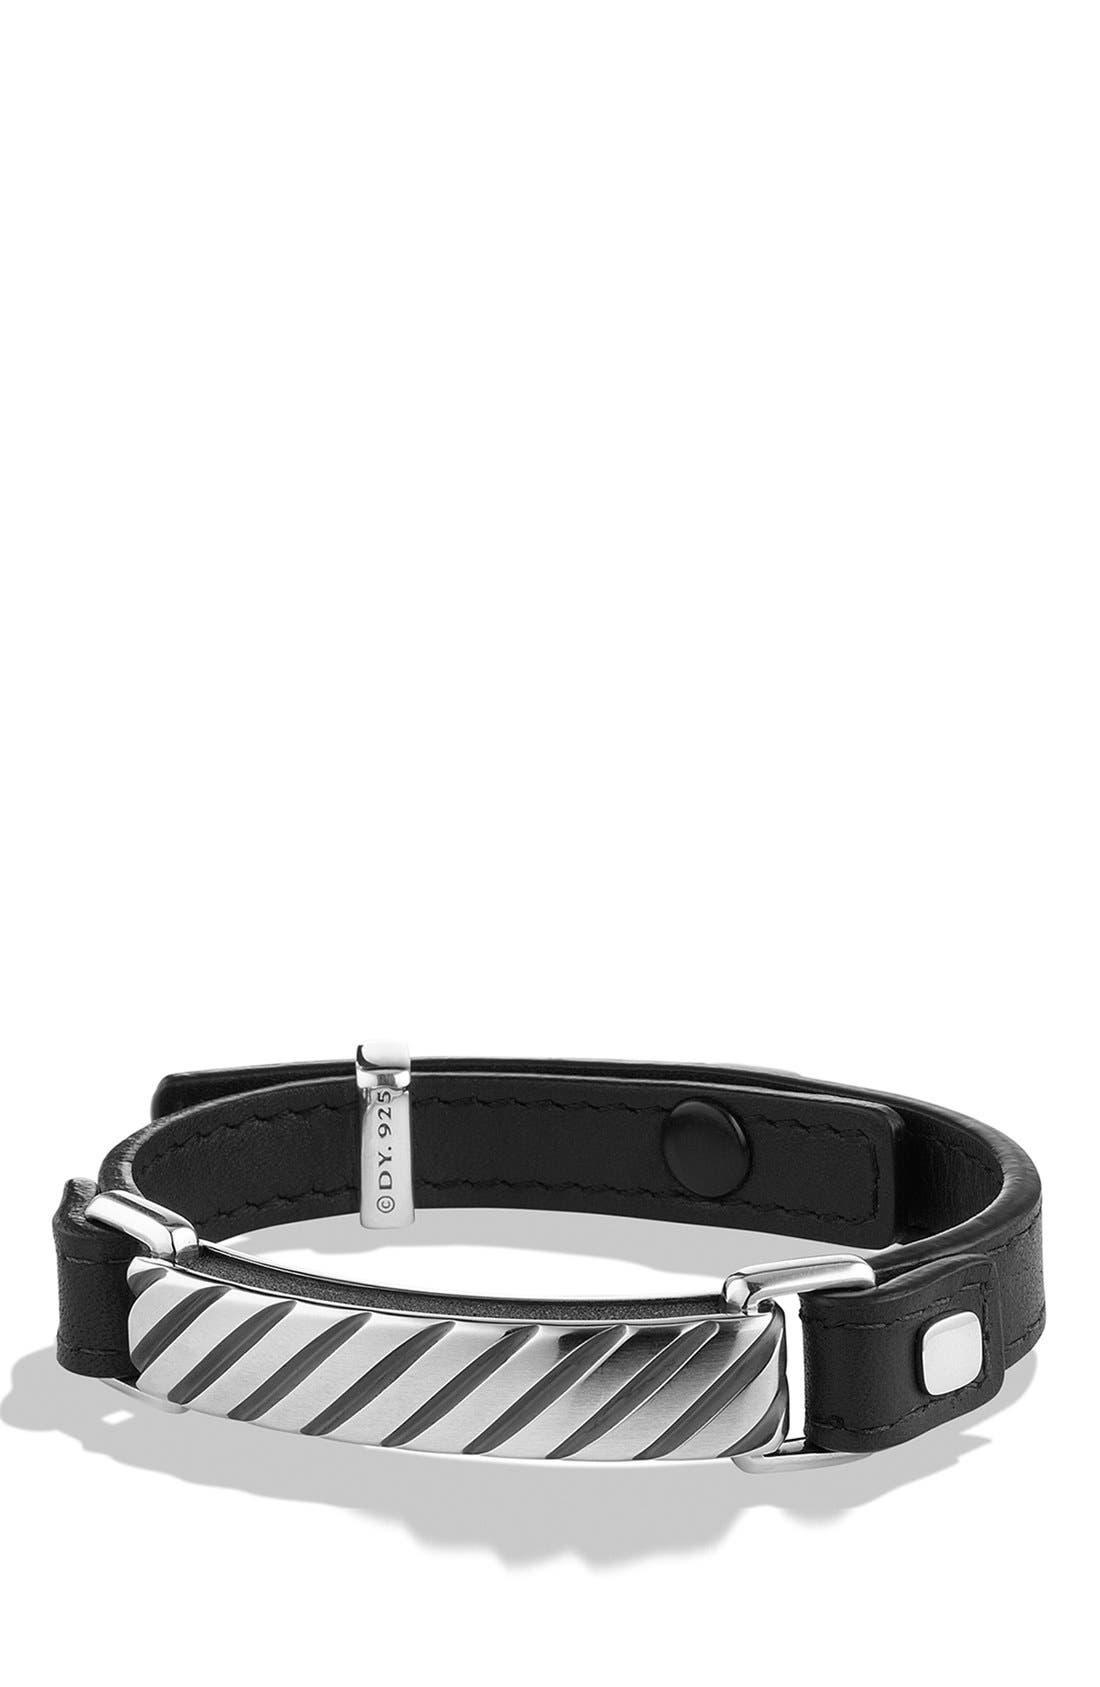 Modern Cable ID Bracelet,                             Main thumbnail 1, color,                             BLACK